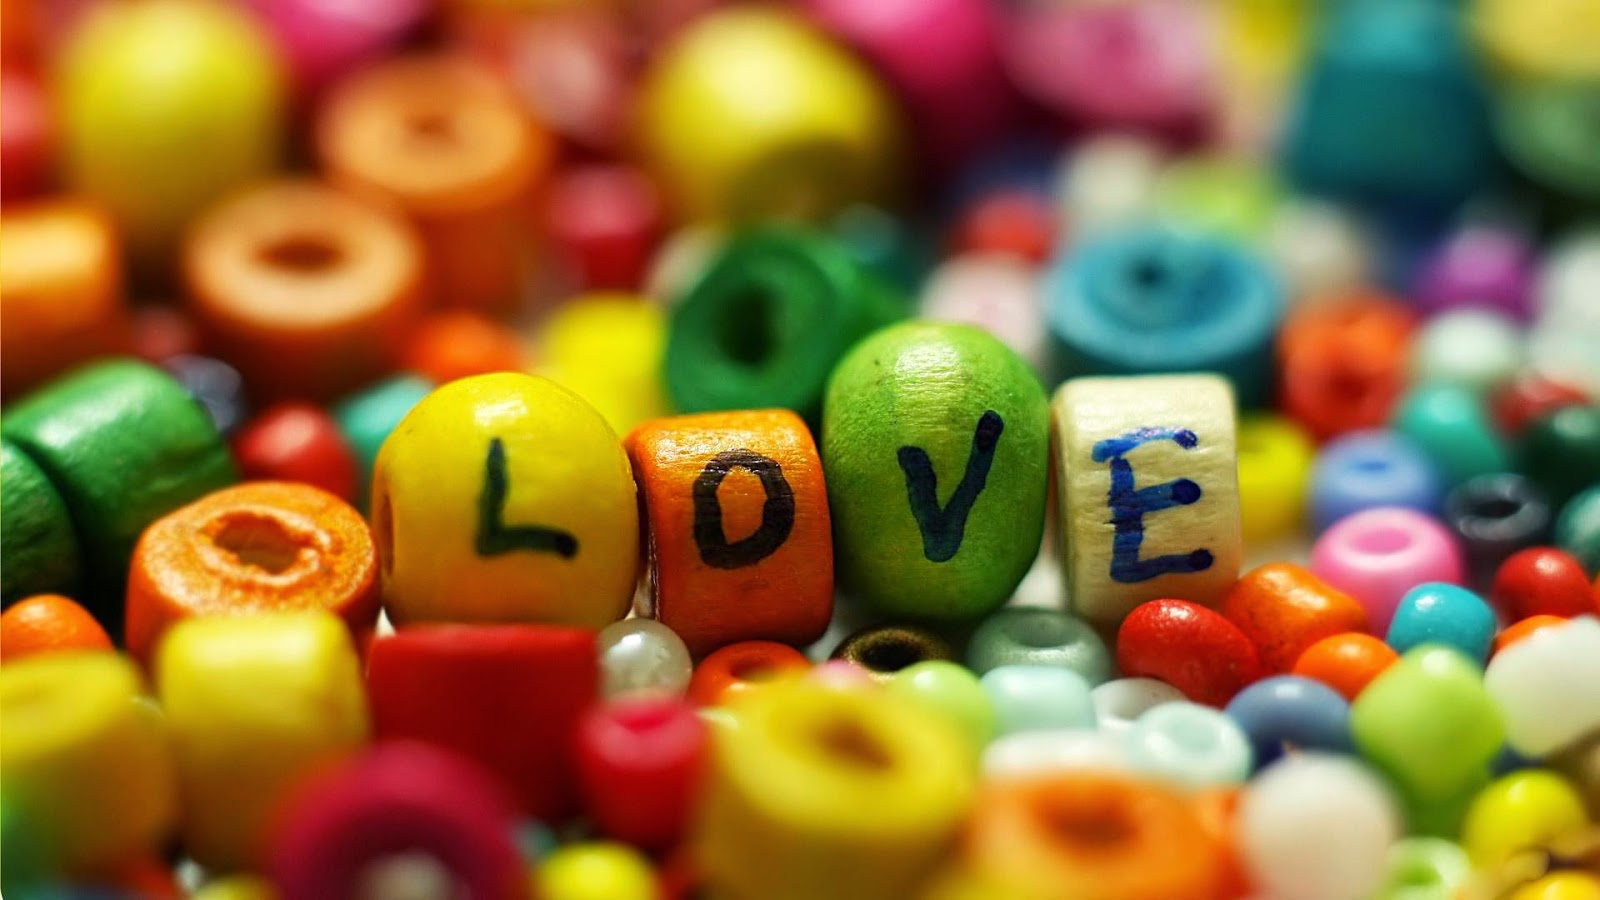 "<img src=""http://2.bp.blogspot.com/-C2Q9nurfIhY/U7vNjWIGciI/AAAAAAAALRM/ZV4p6YjZ6so/s1600/love-wallpaper.jpg"" alt=""Love Wallpaper"" />"